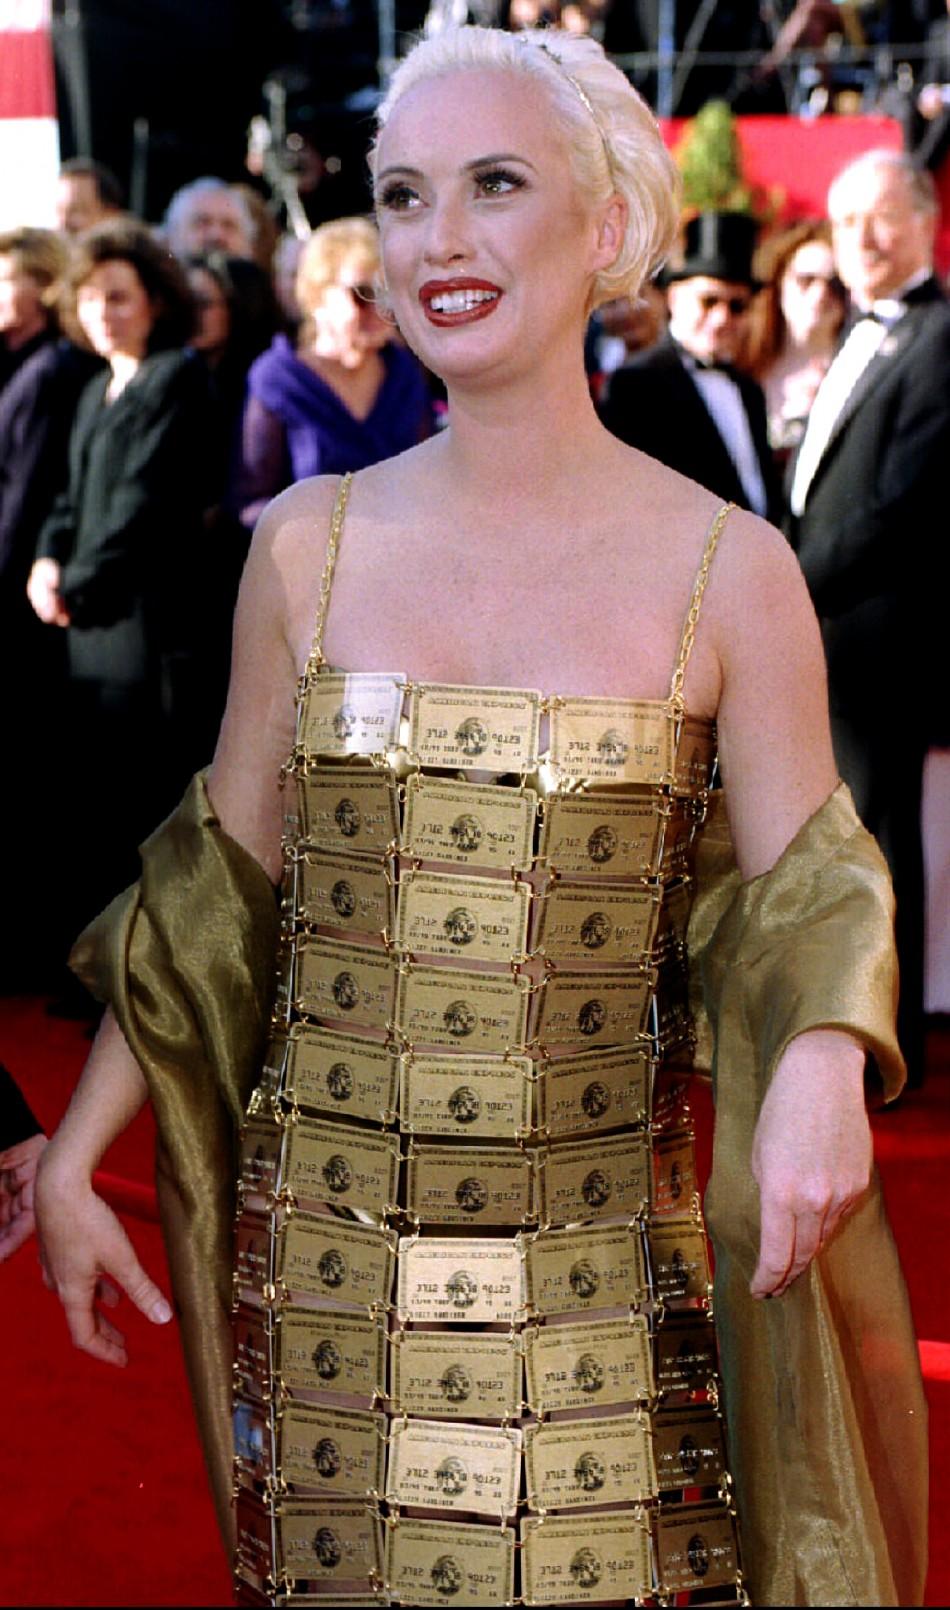 oscars 2013 worst dressed celebrities in academy awards